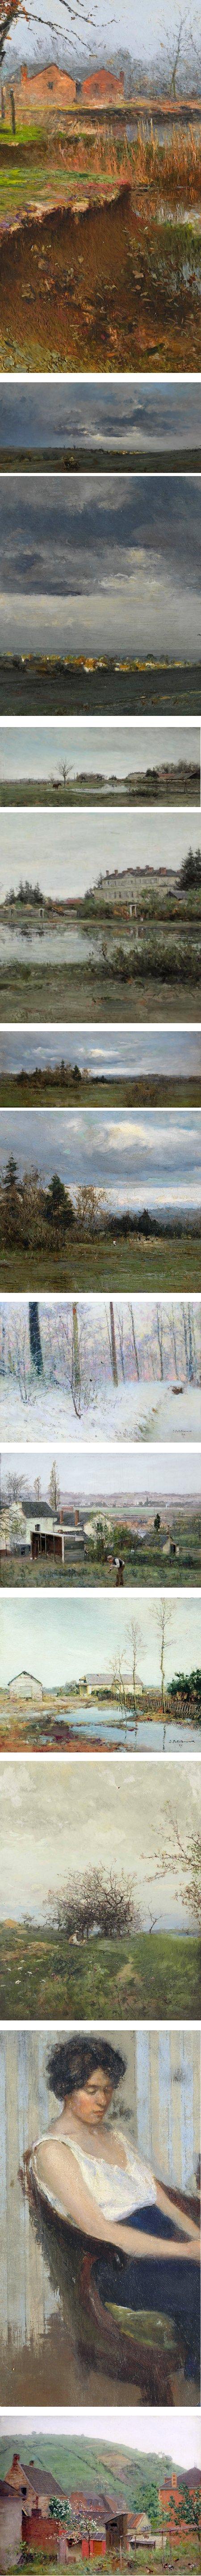 Ivan Pavlovich Pokhitonov, Russian landscape painter